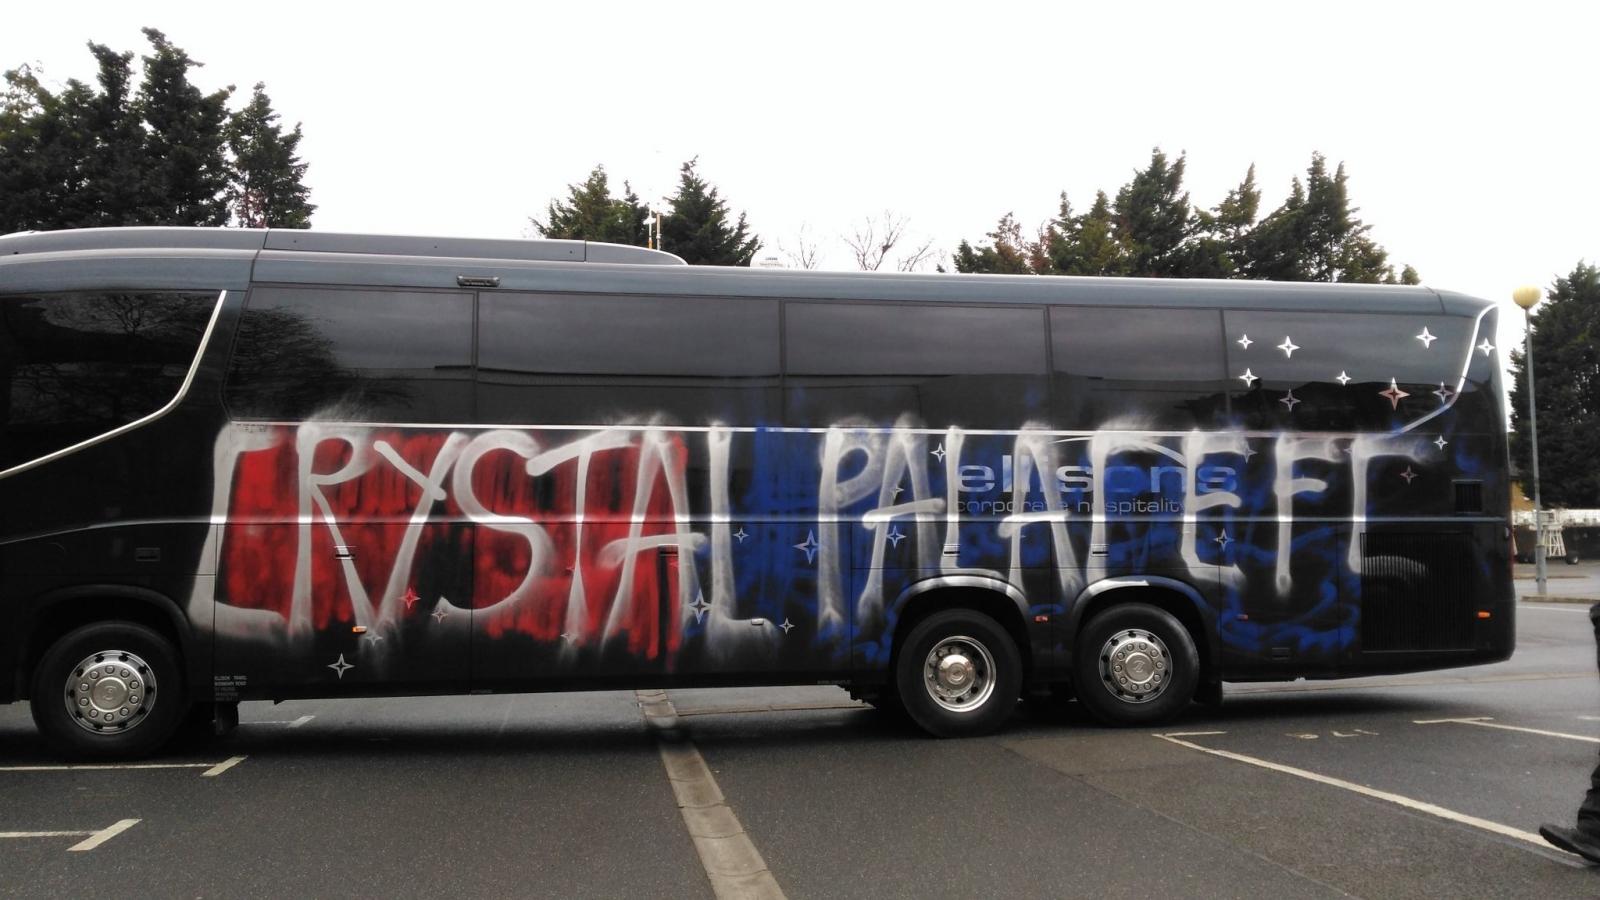 Crystal Palace bus vandalised